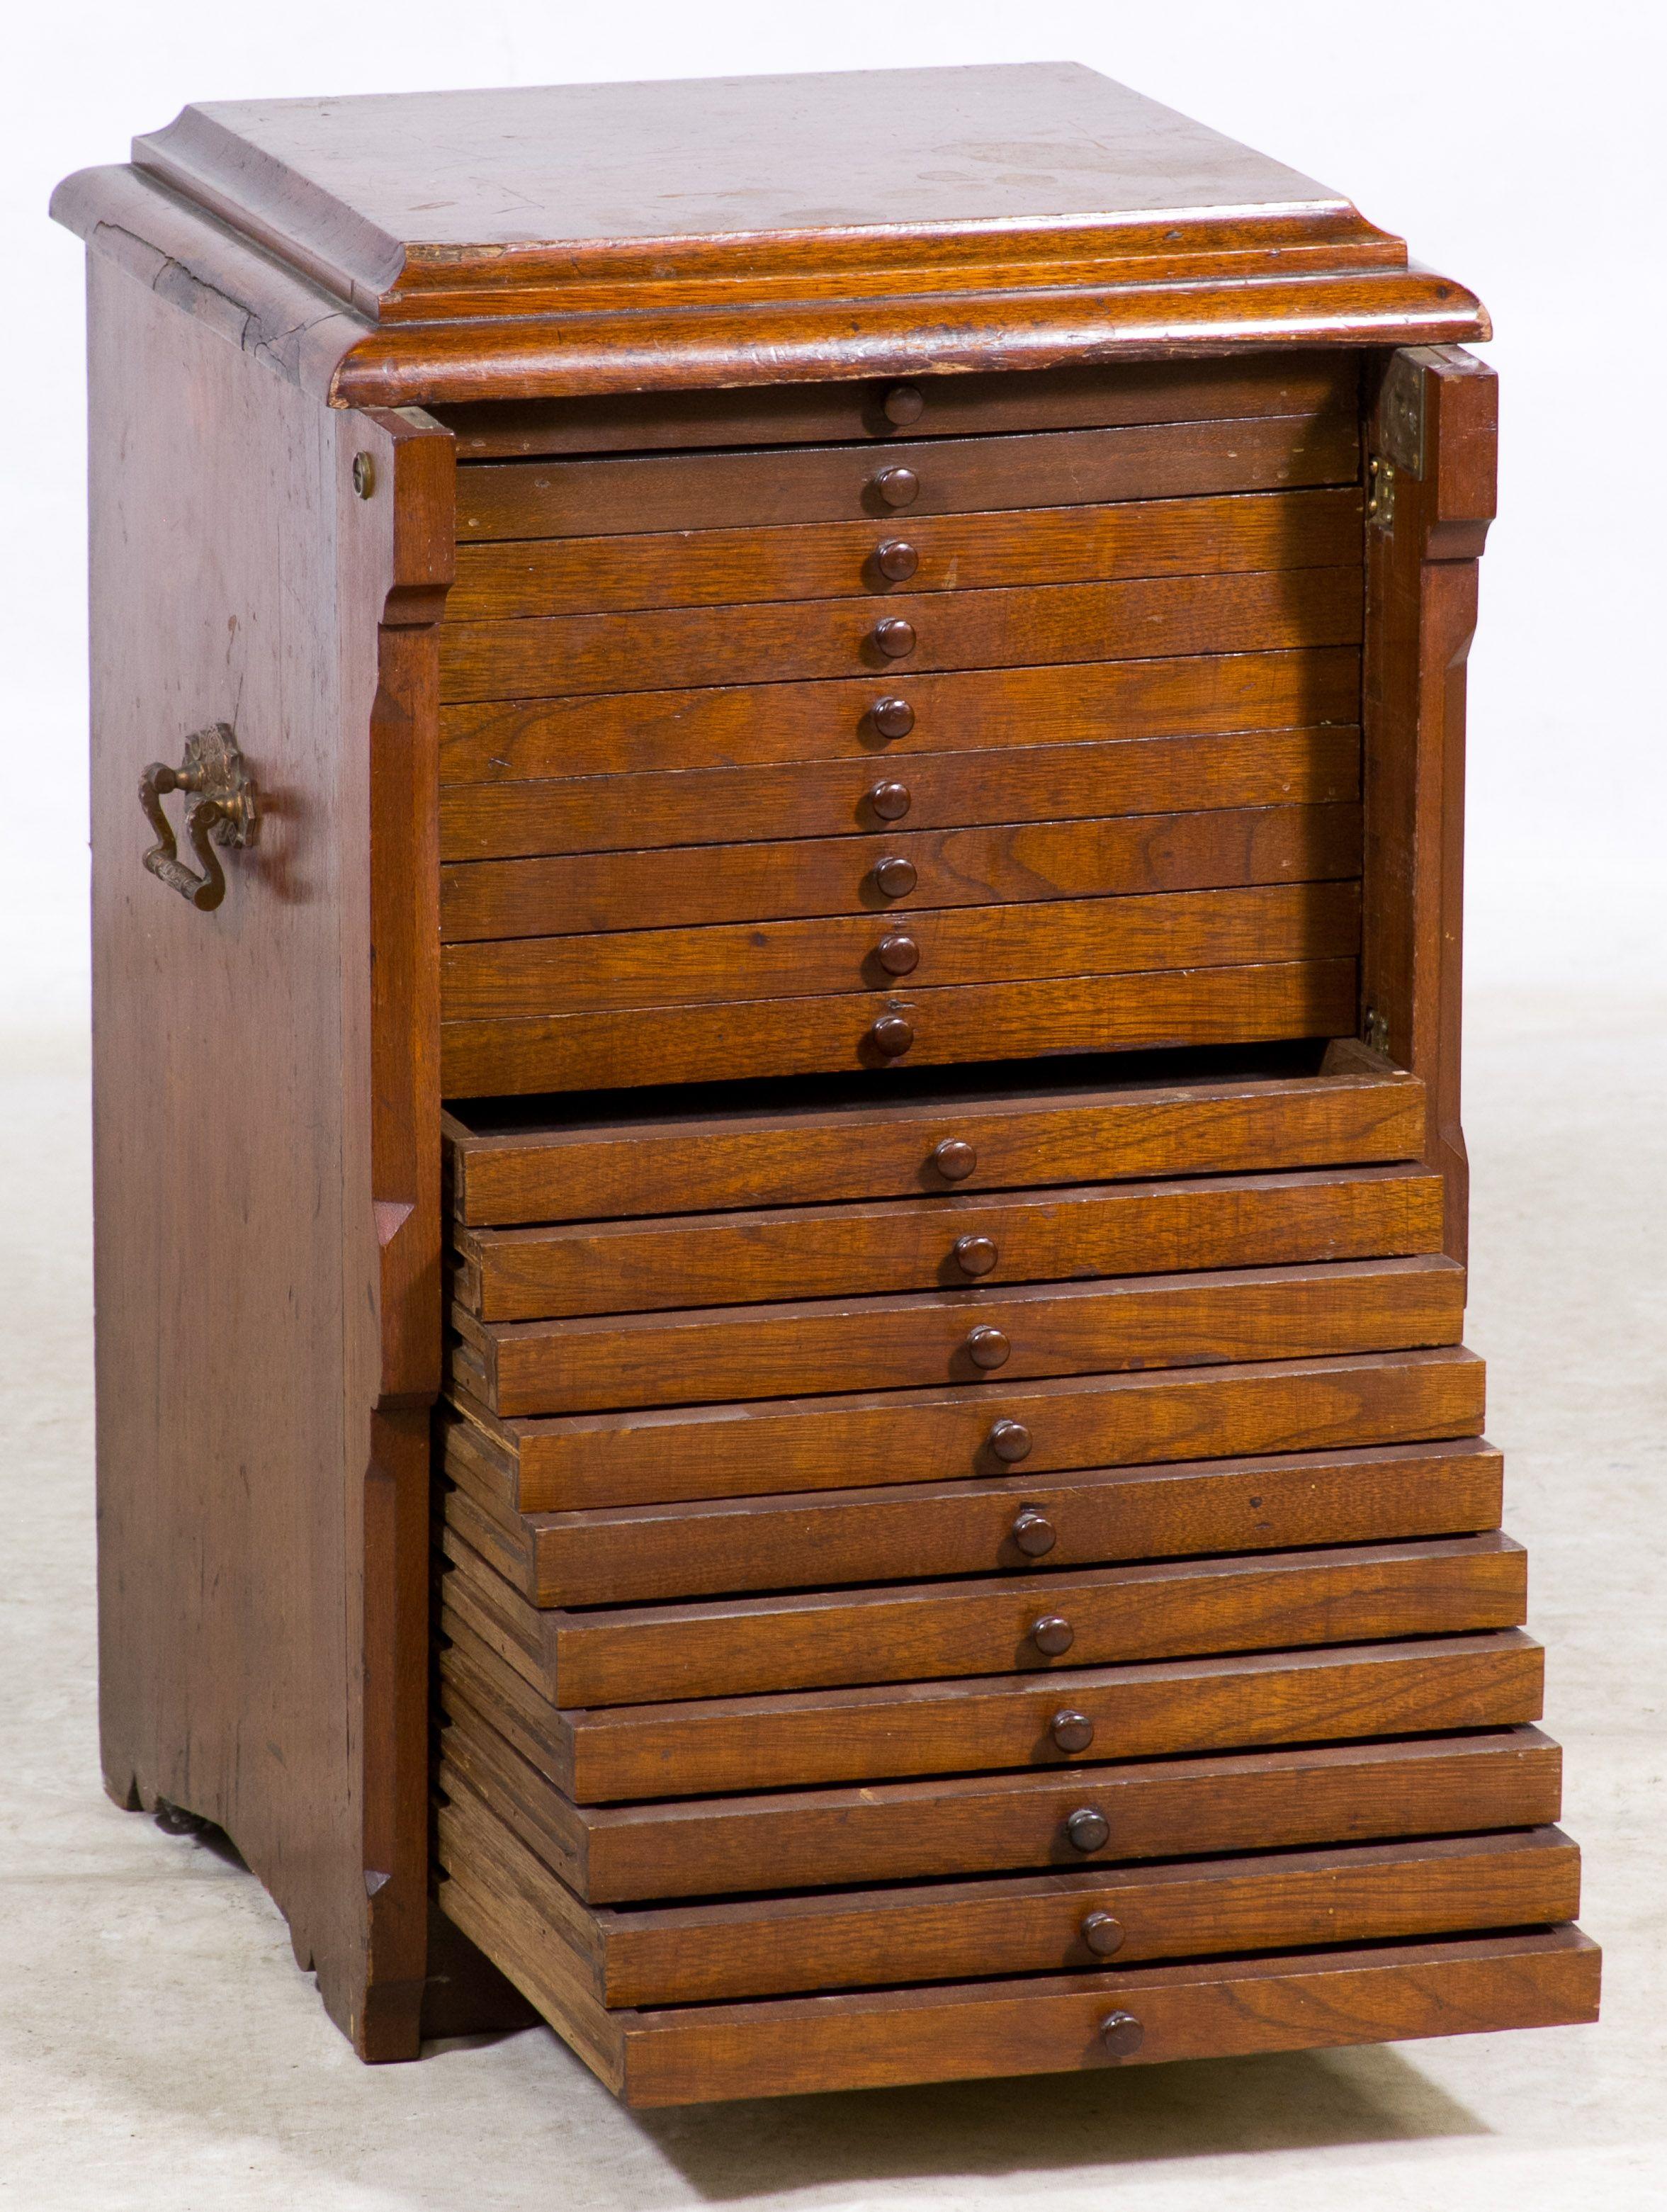 Lot 96 Walnut Jewelers Cabinet Small cabinet having